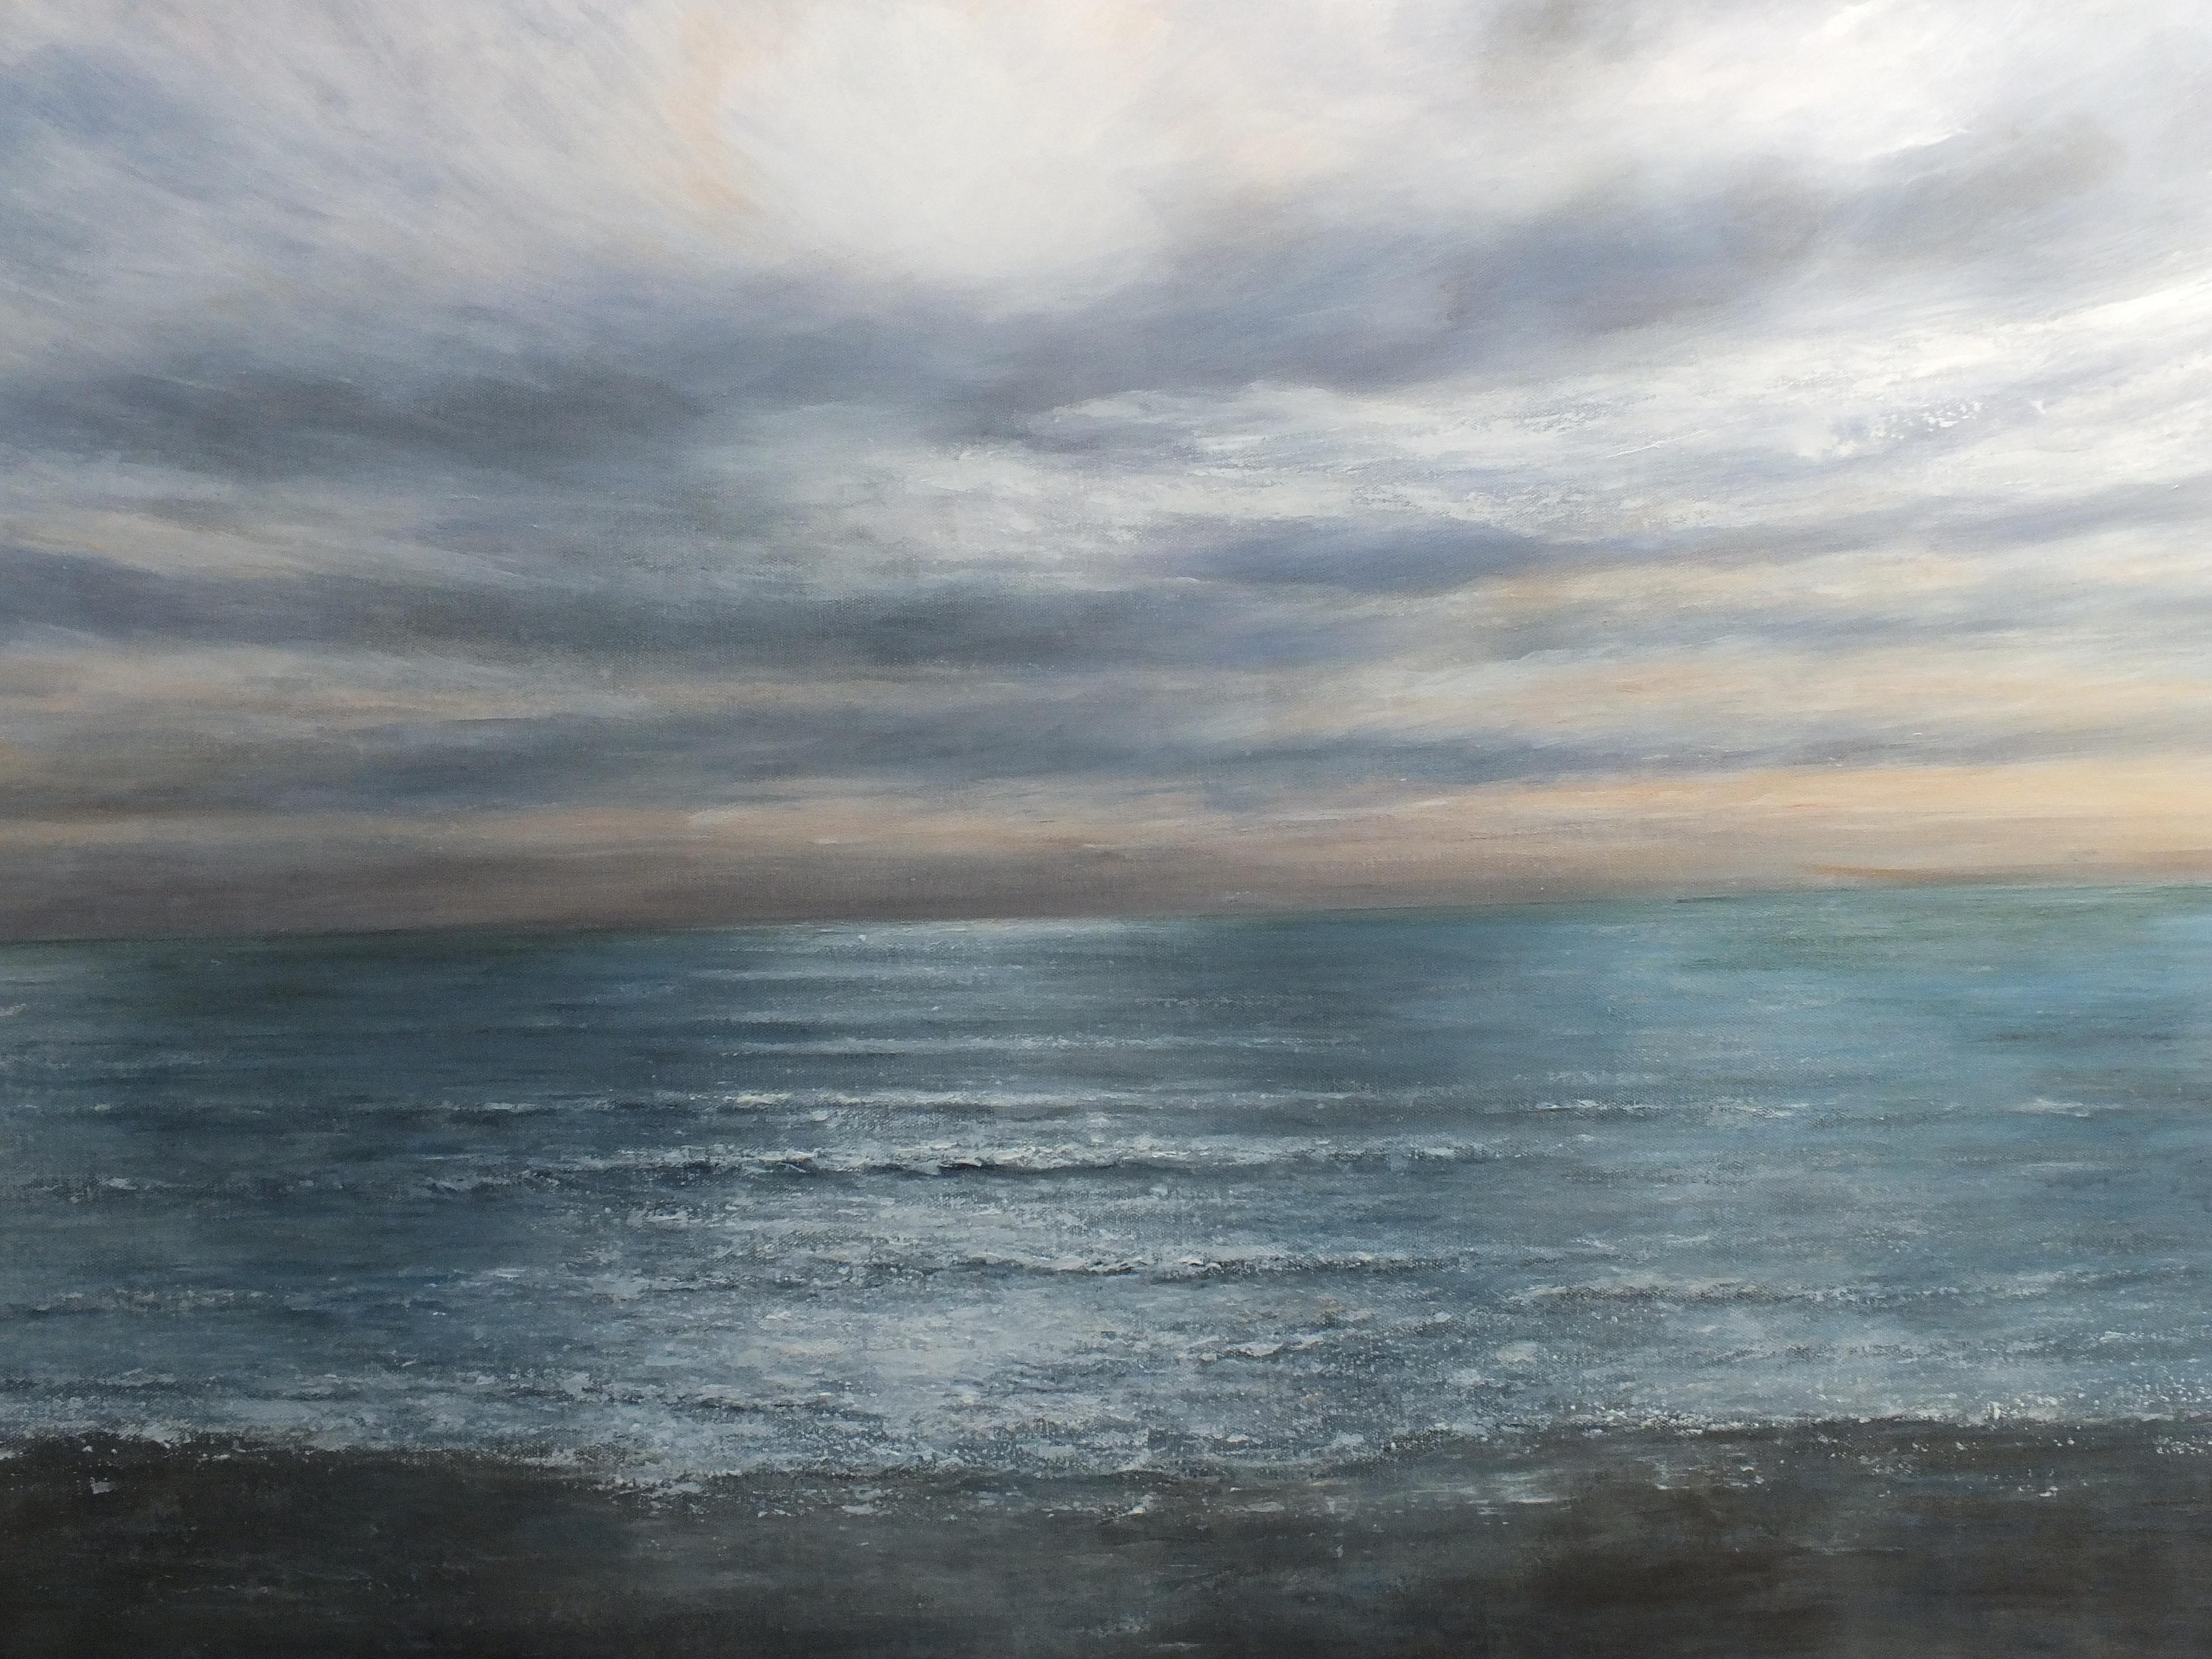 Sparkling white capped waves and big surf crashing ashore.